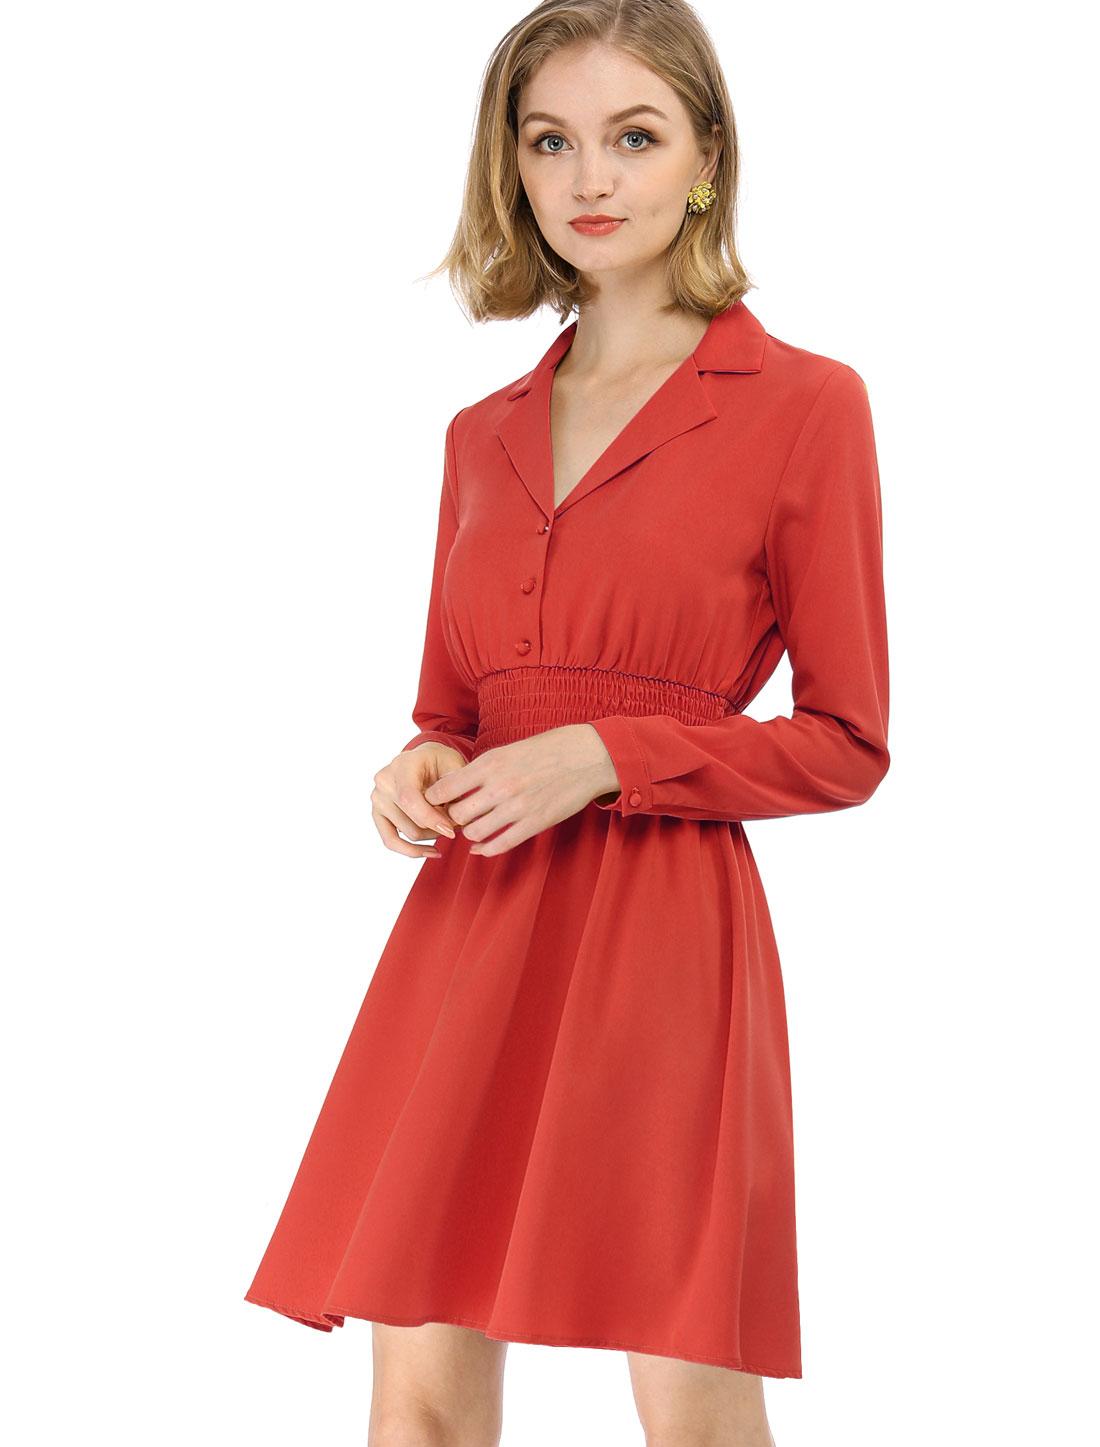 Allegra K Women's Notched Lapel Smocked Waist A-Line Dress Red Orange S